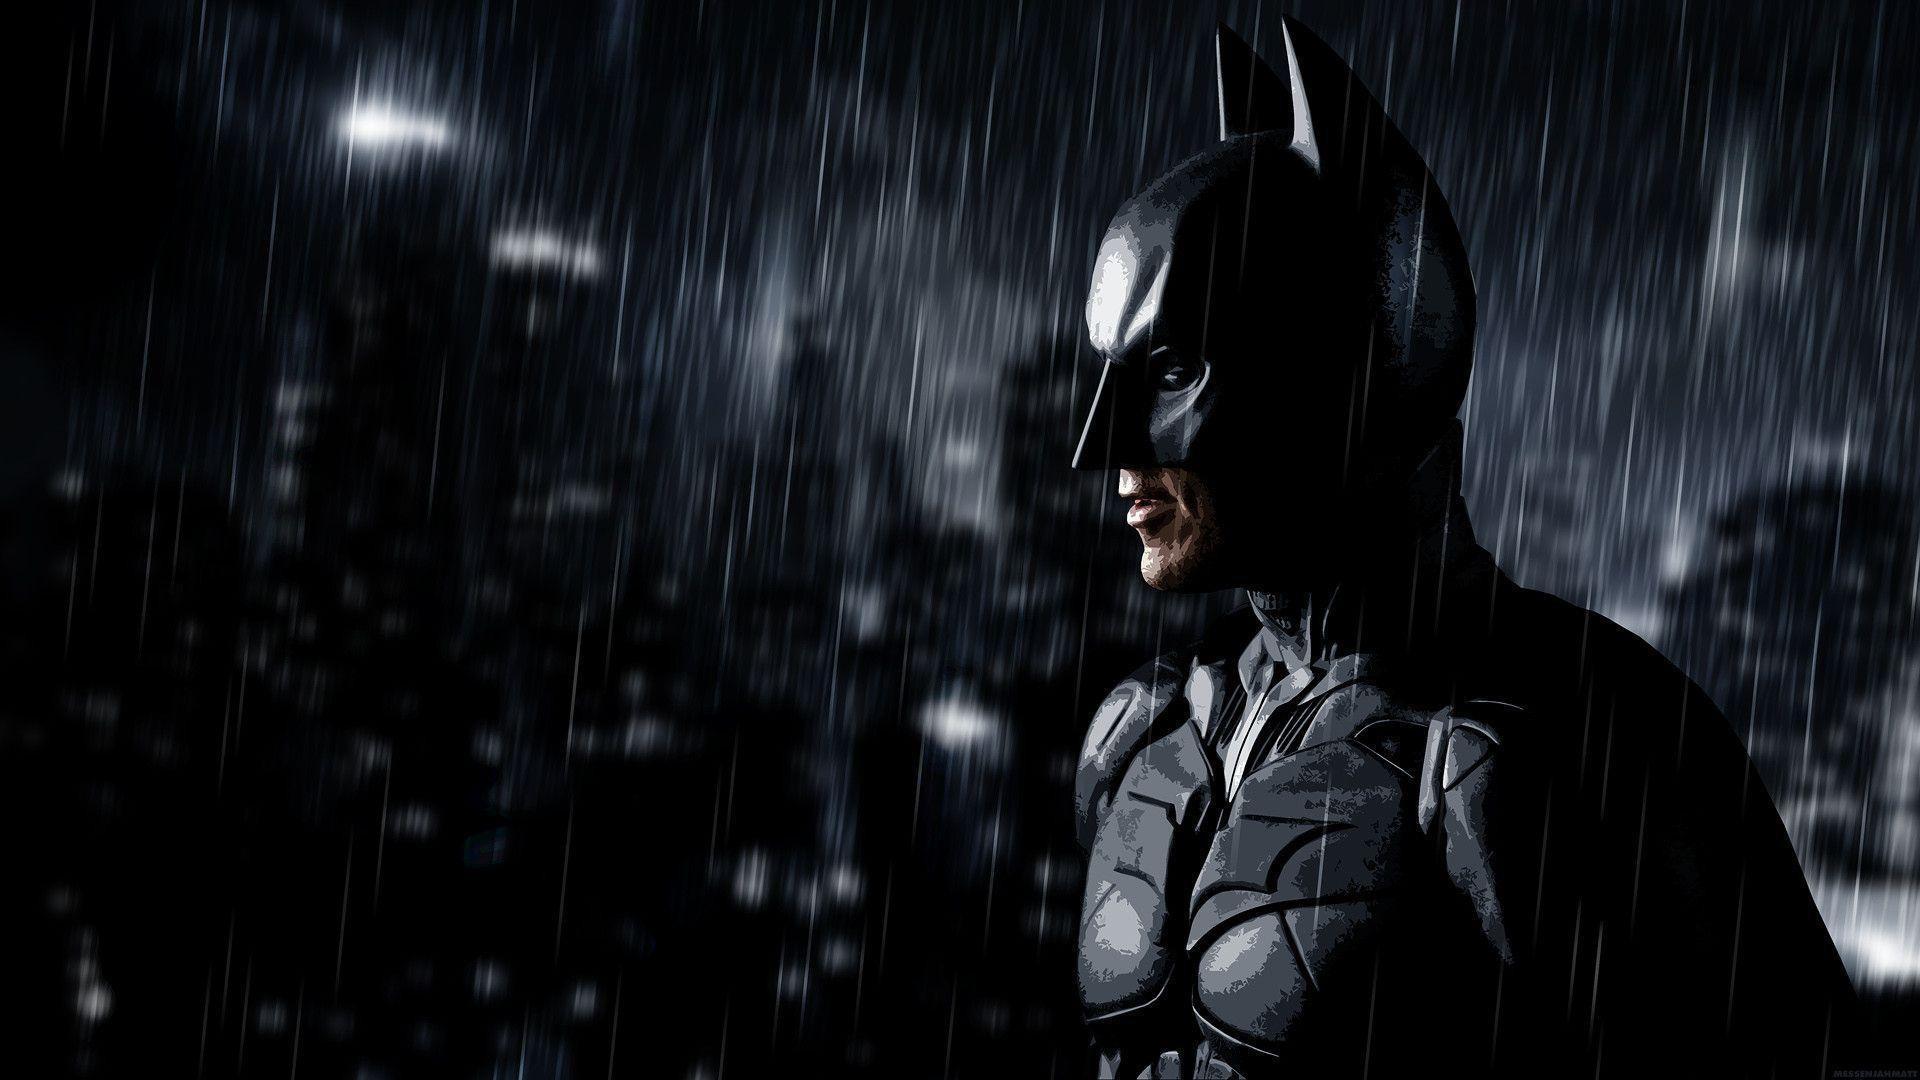 Batman Christmas Wallpaper 76 Images